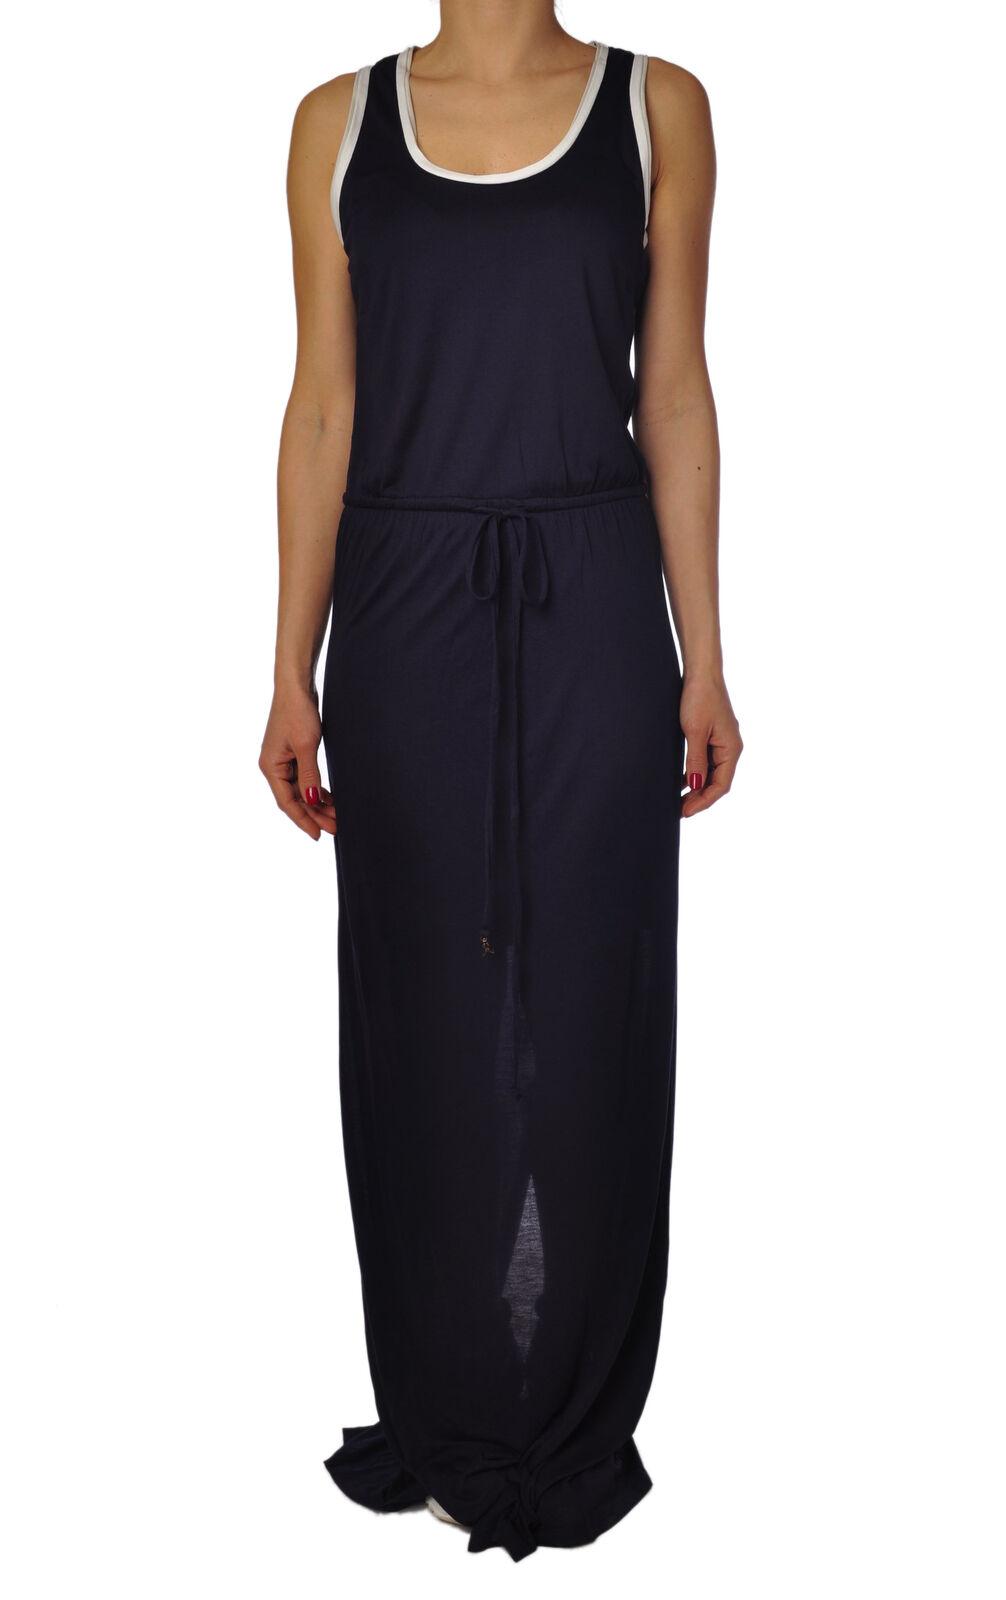 Patrizia Pepe - Dresses-Dress - woman - bluee - 767817C181753